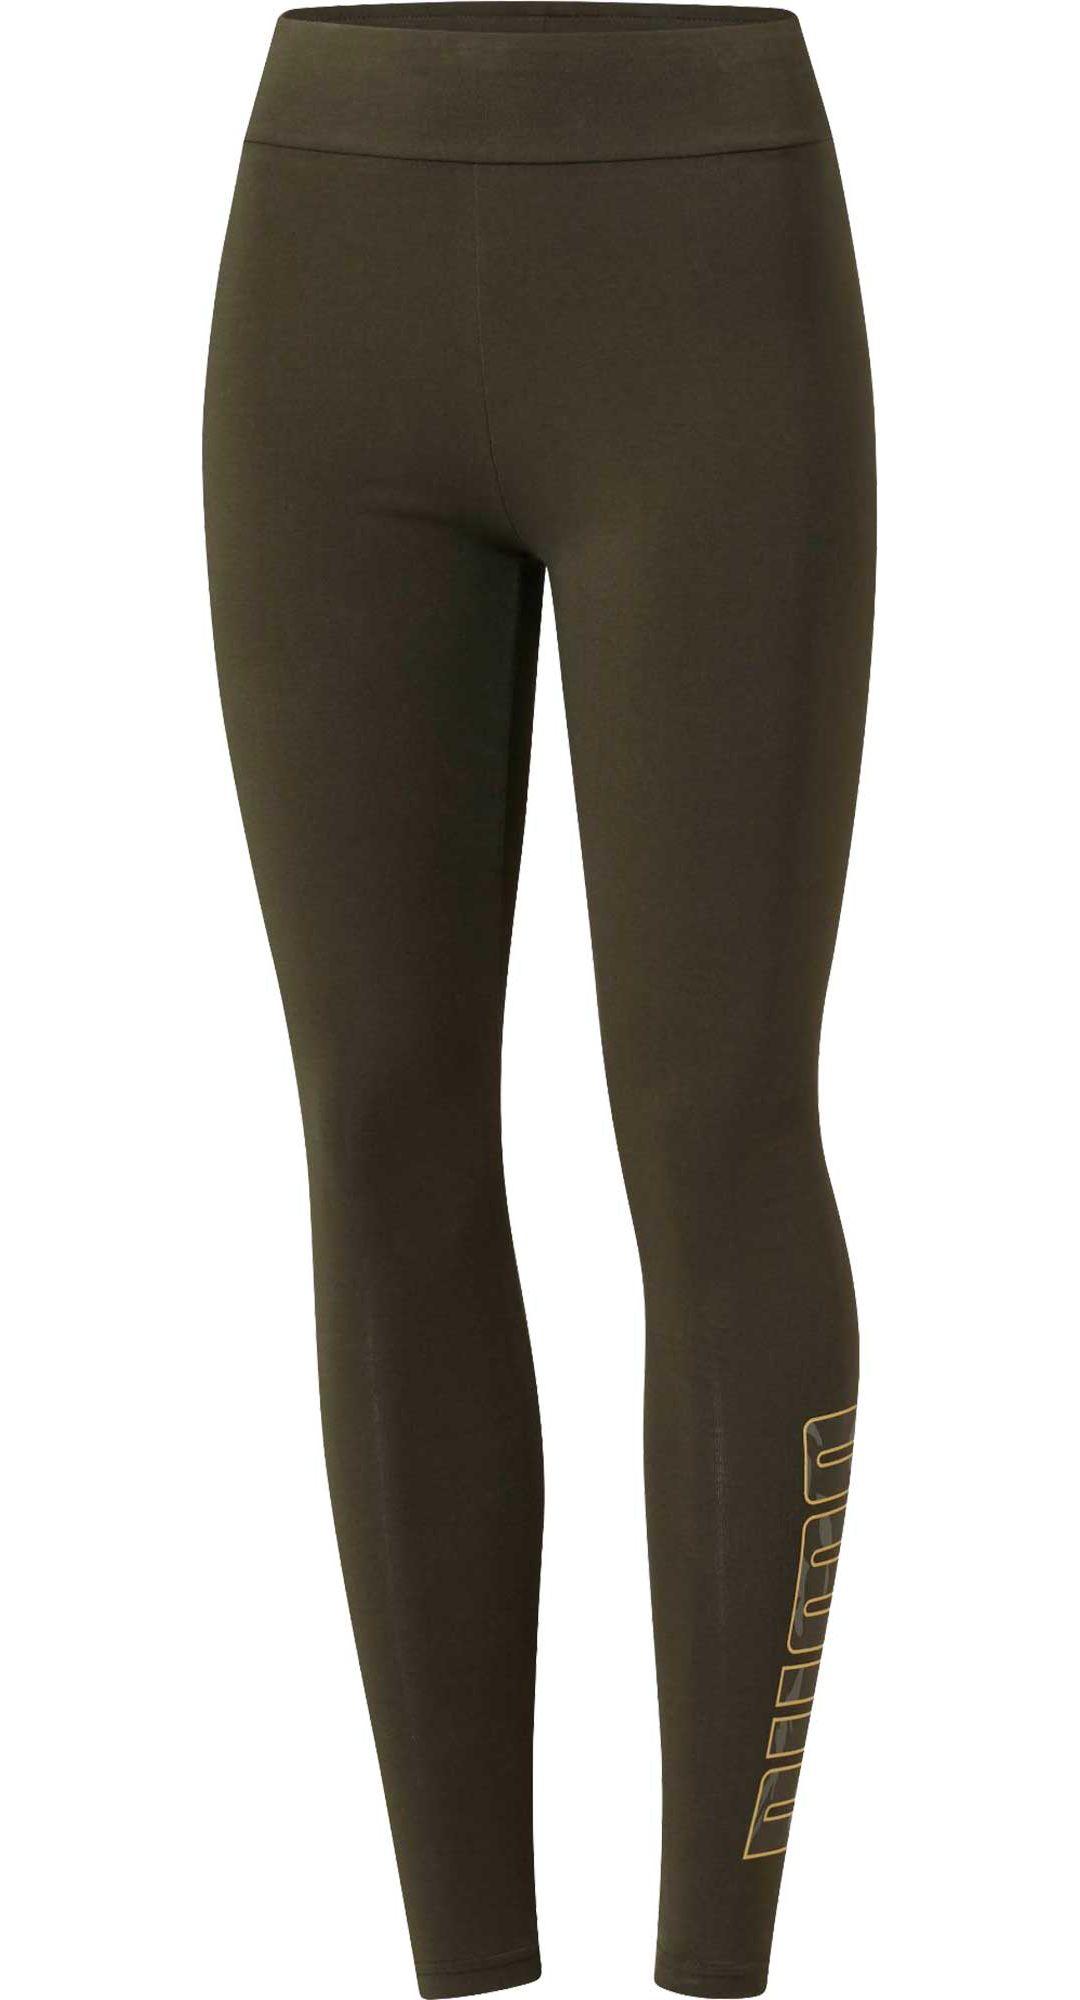 5e2f1264f6b4d PUMA Women's Camo Leggings | DICK'S Sporting Goods